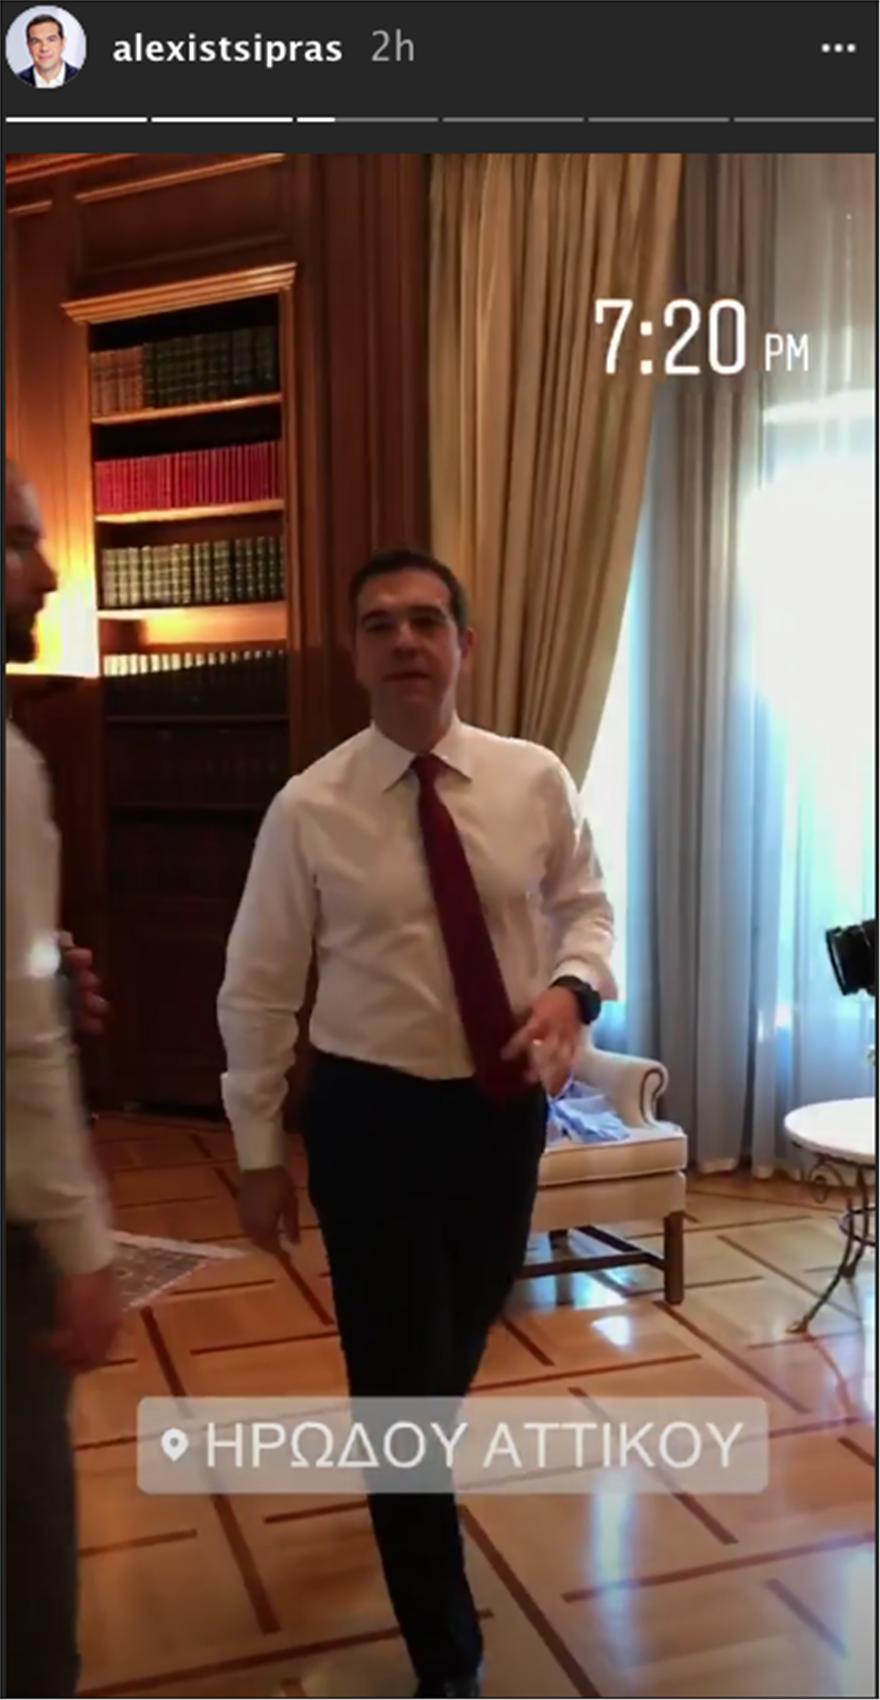 tsipras-insta-gra2